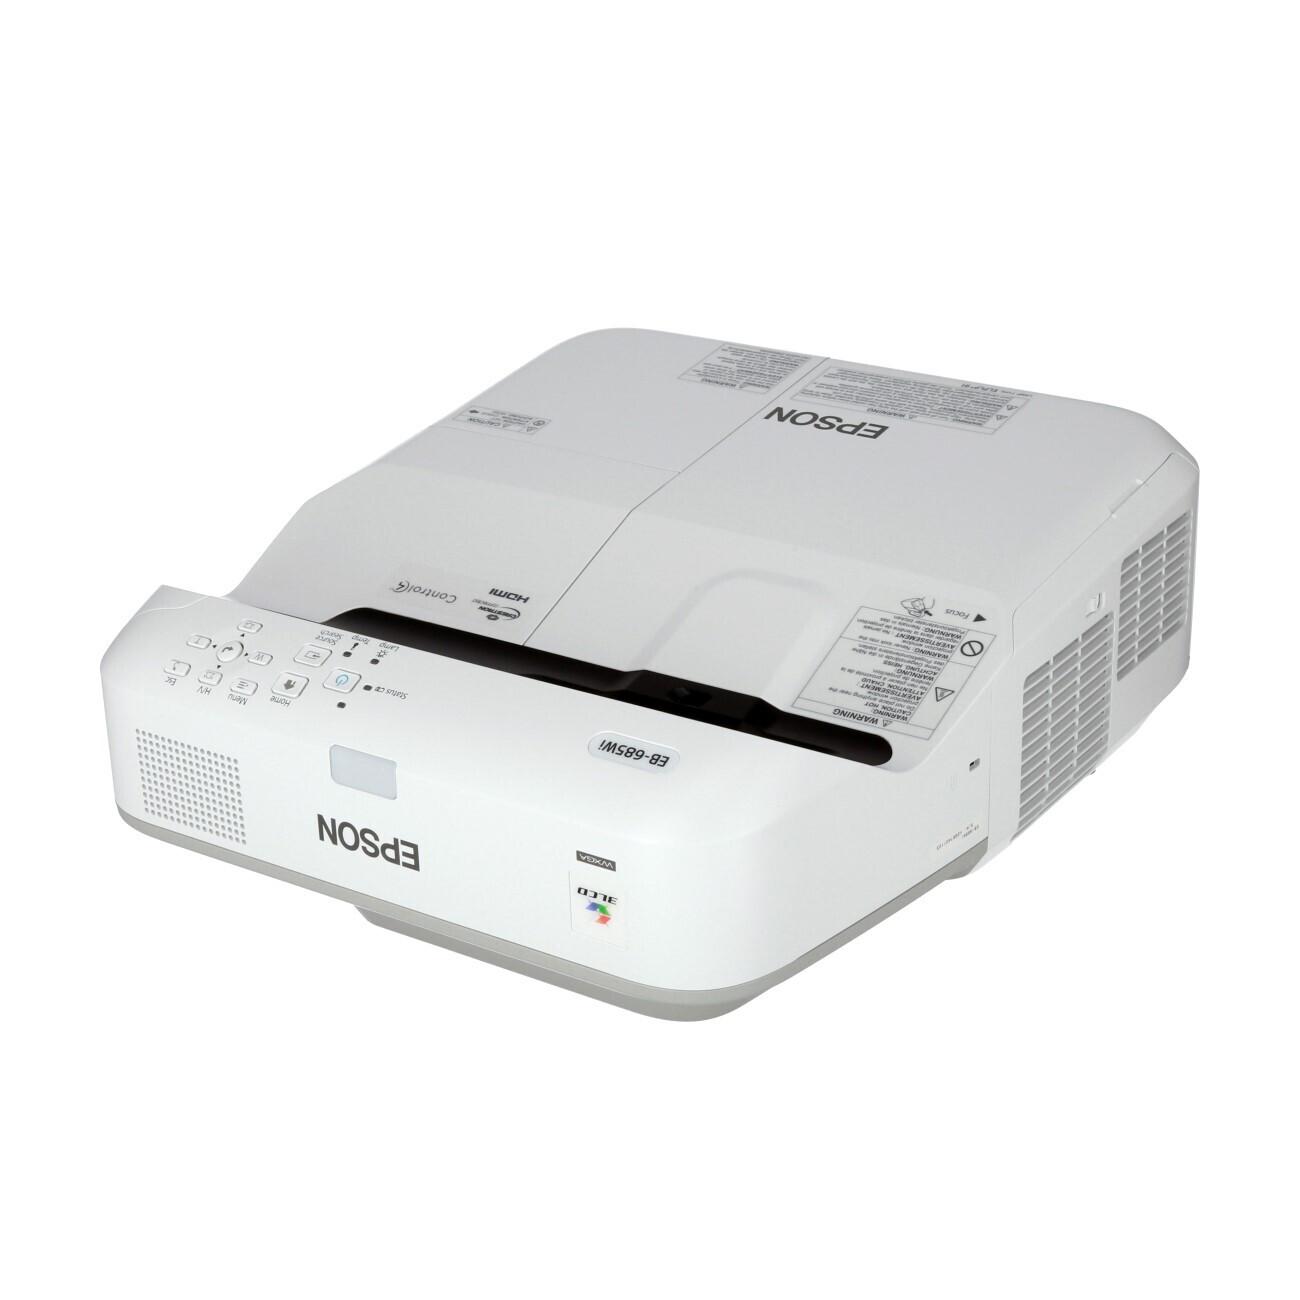 Epson EB-685Wi Kurzdistanzbeamer mit 3500 ANSI-Lumen und WXGA